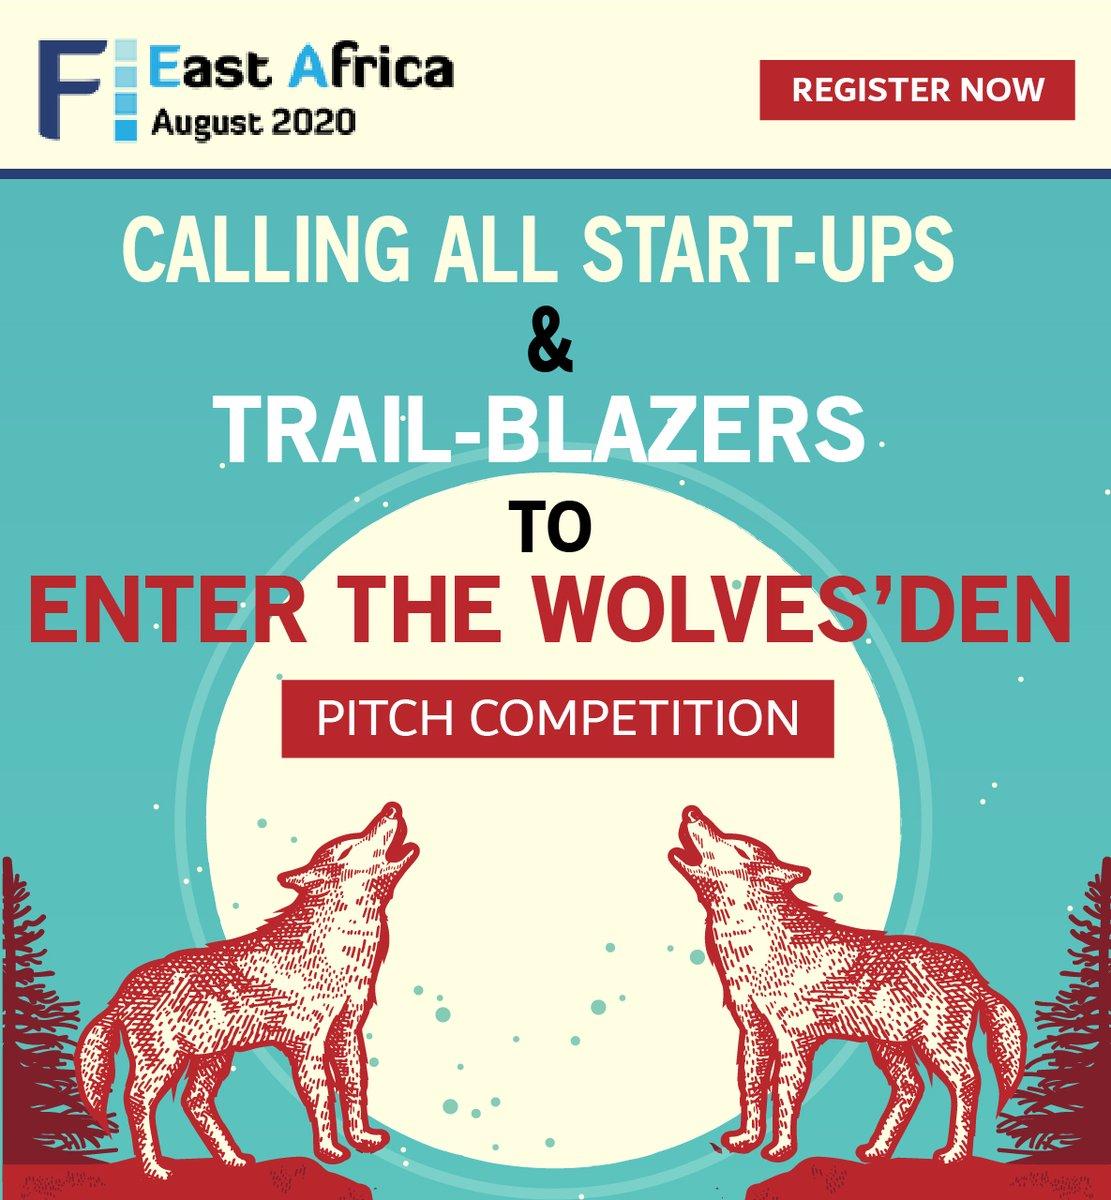 Enter The Wolves' Den - https://mailchi.mp/finnovationworld/enter-the…  #paymentsinnovation #financialinclusion #blockchain #mobilemoney #digitalwallets #digitaltransformation #fintech #banking #awardsnight #networking #lastminute #eastafricapic.twitter.com/ytfuV8NTQd